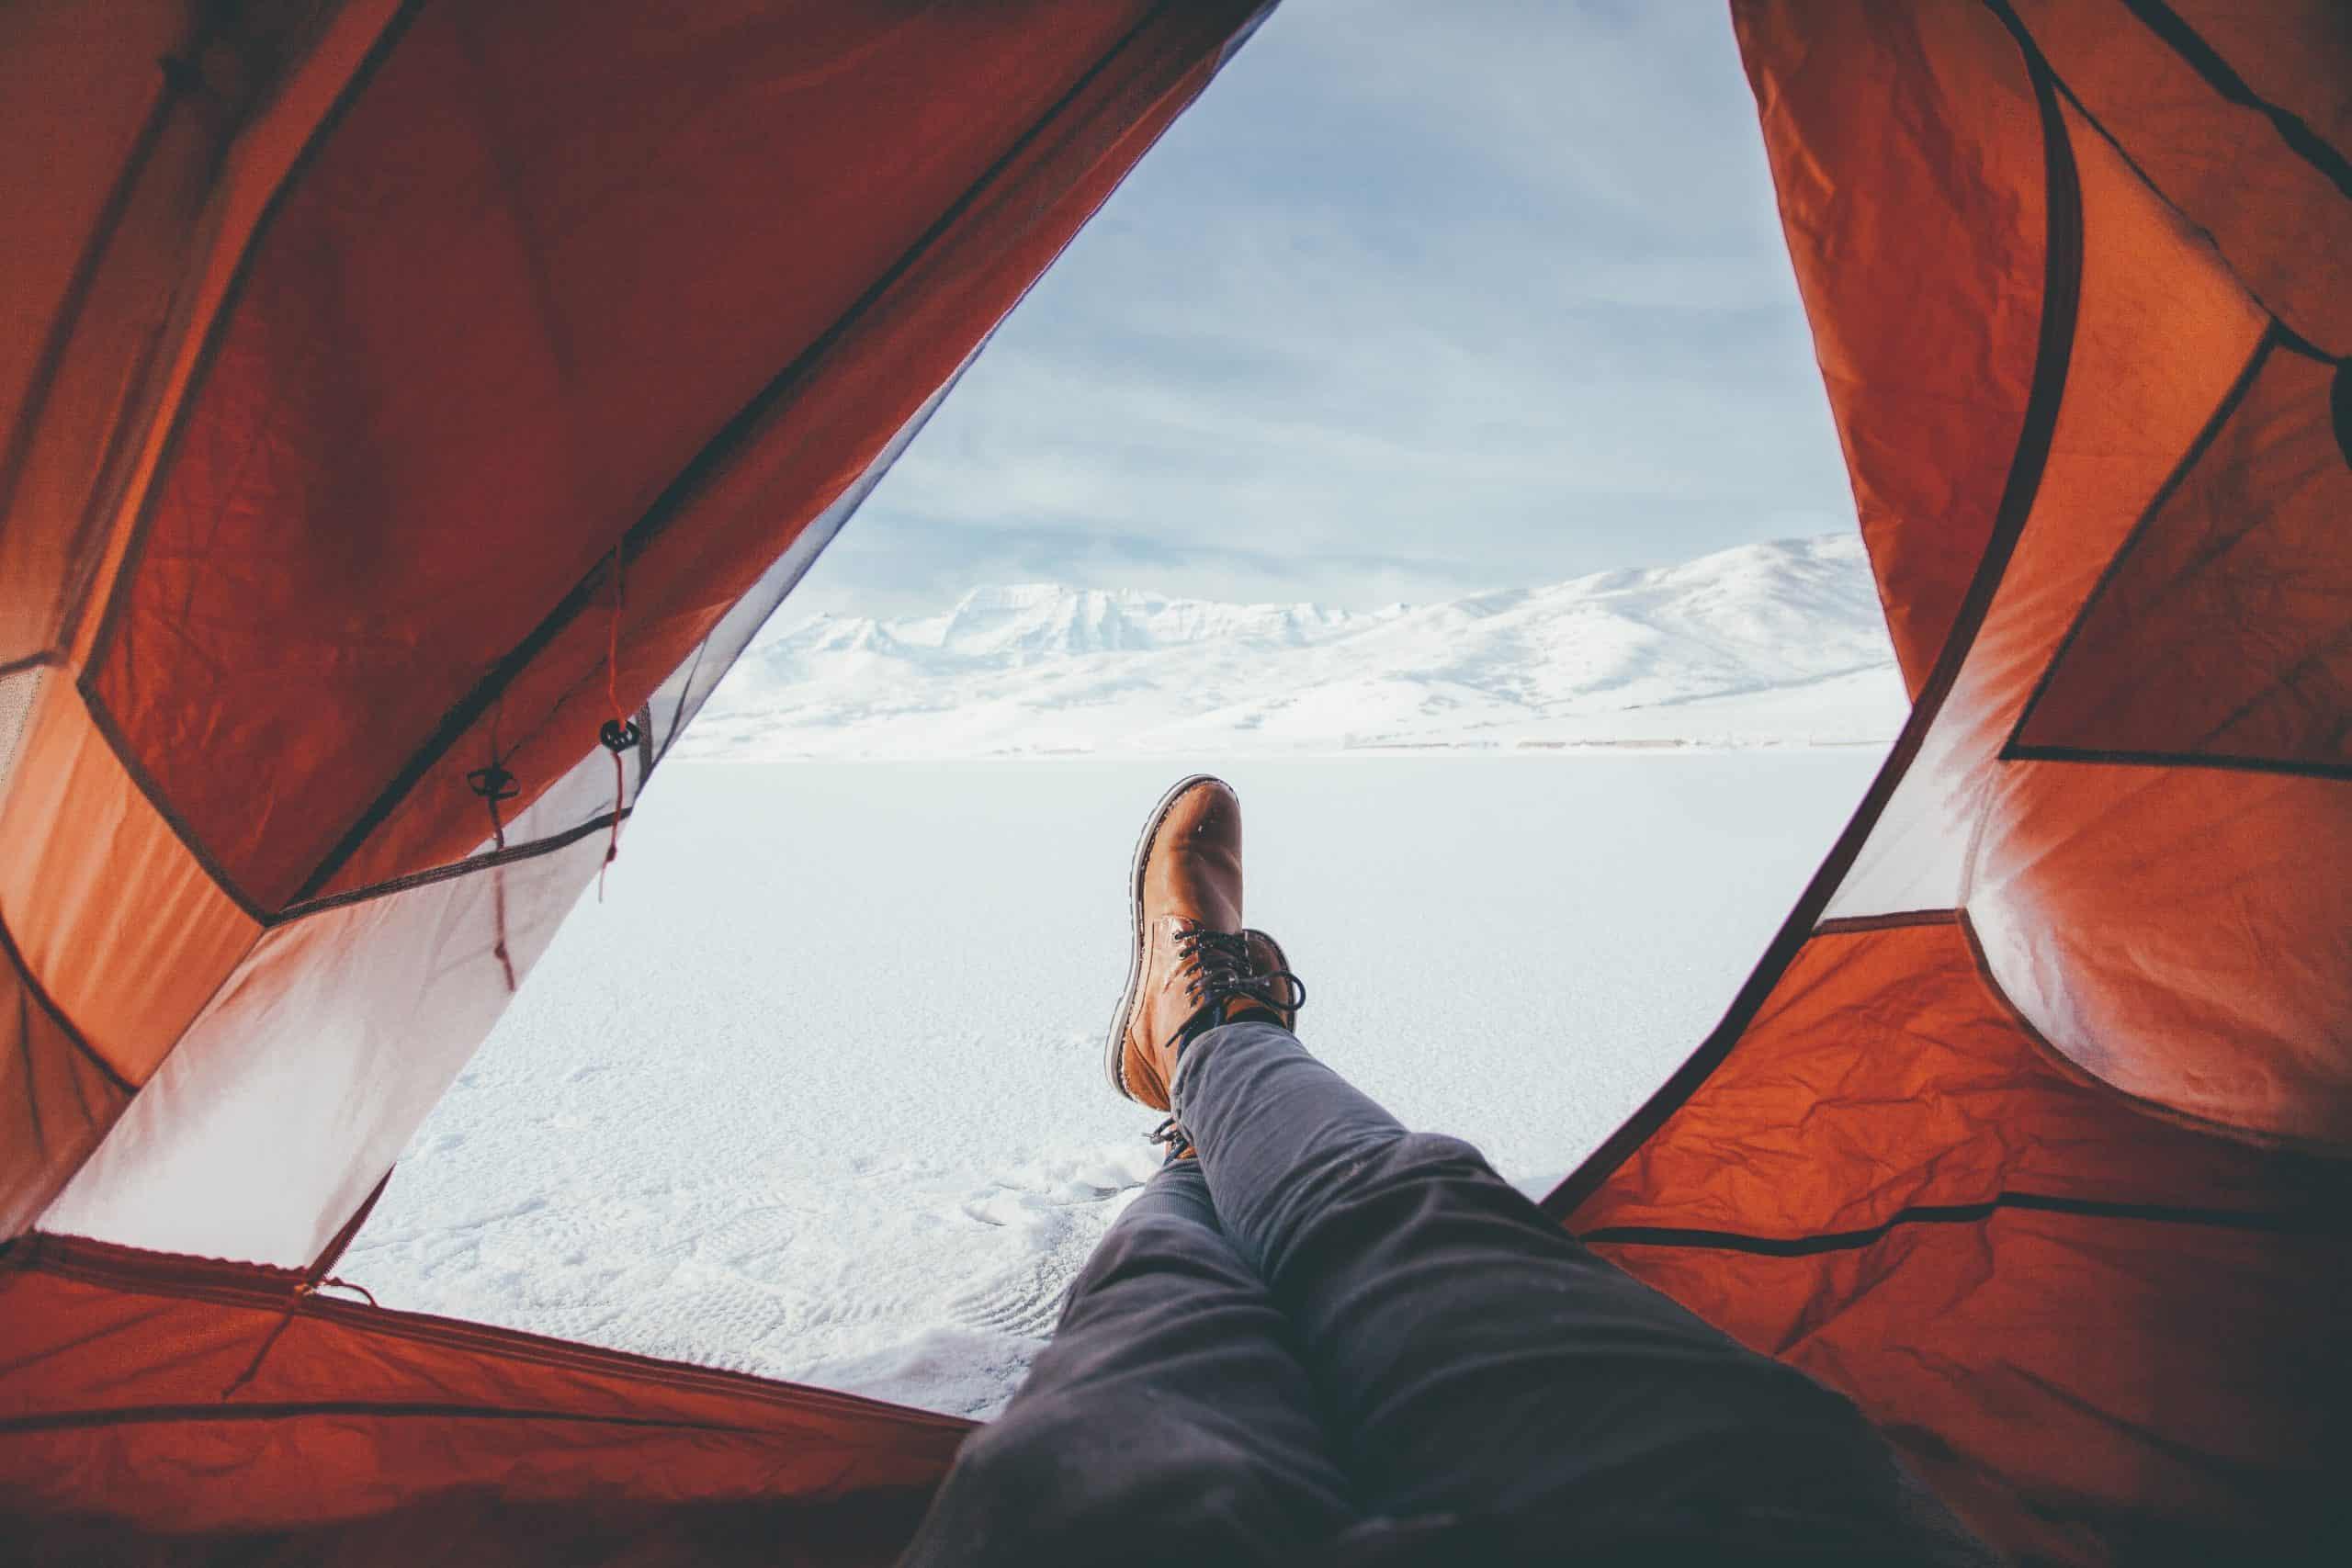 a man enjoying winter camping